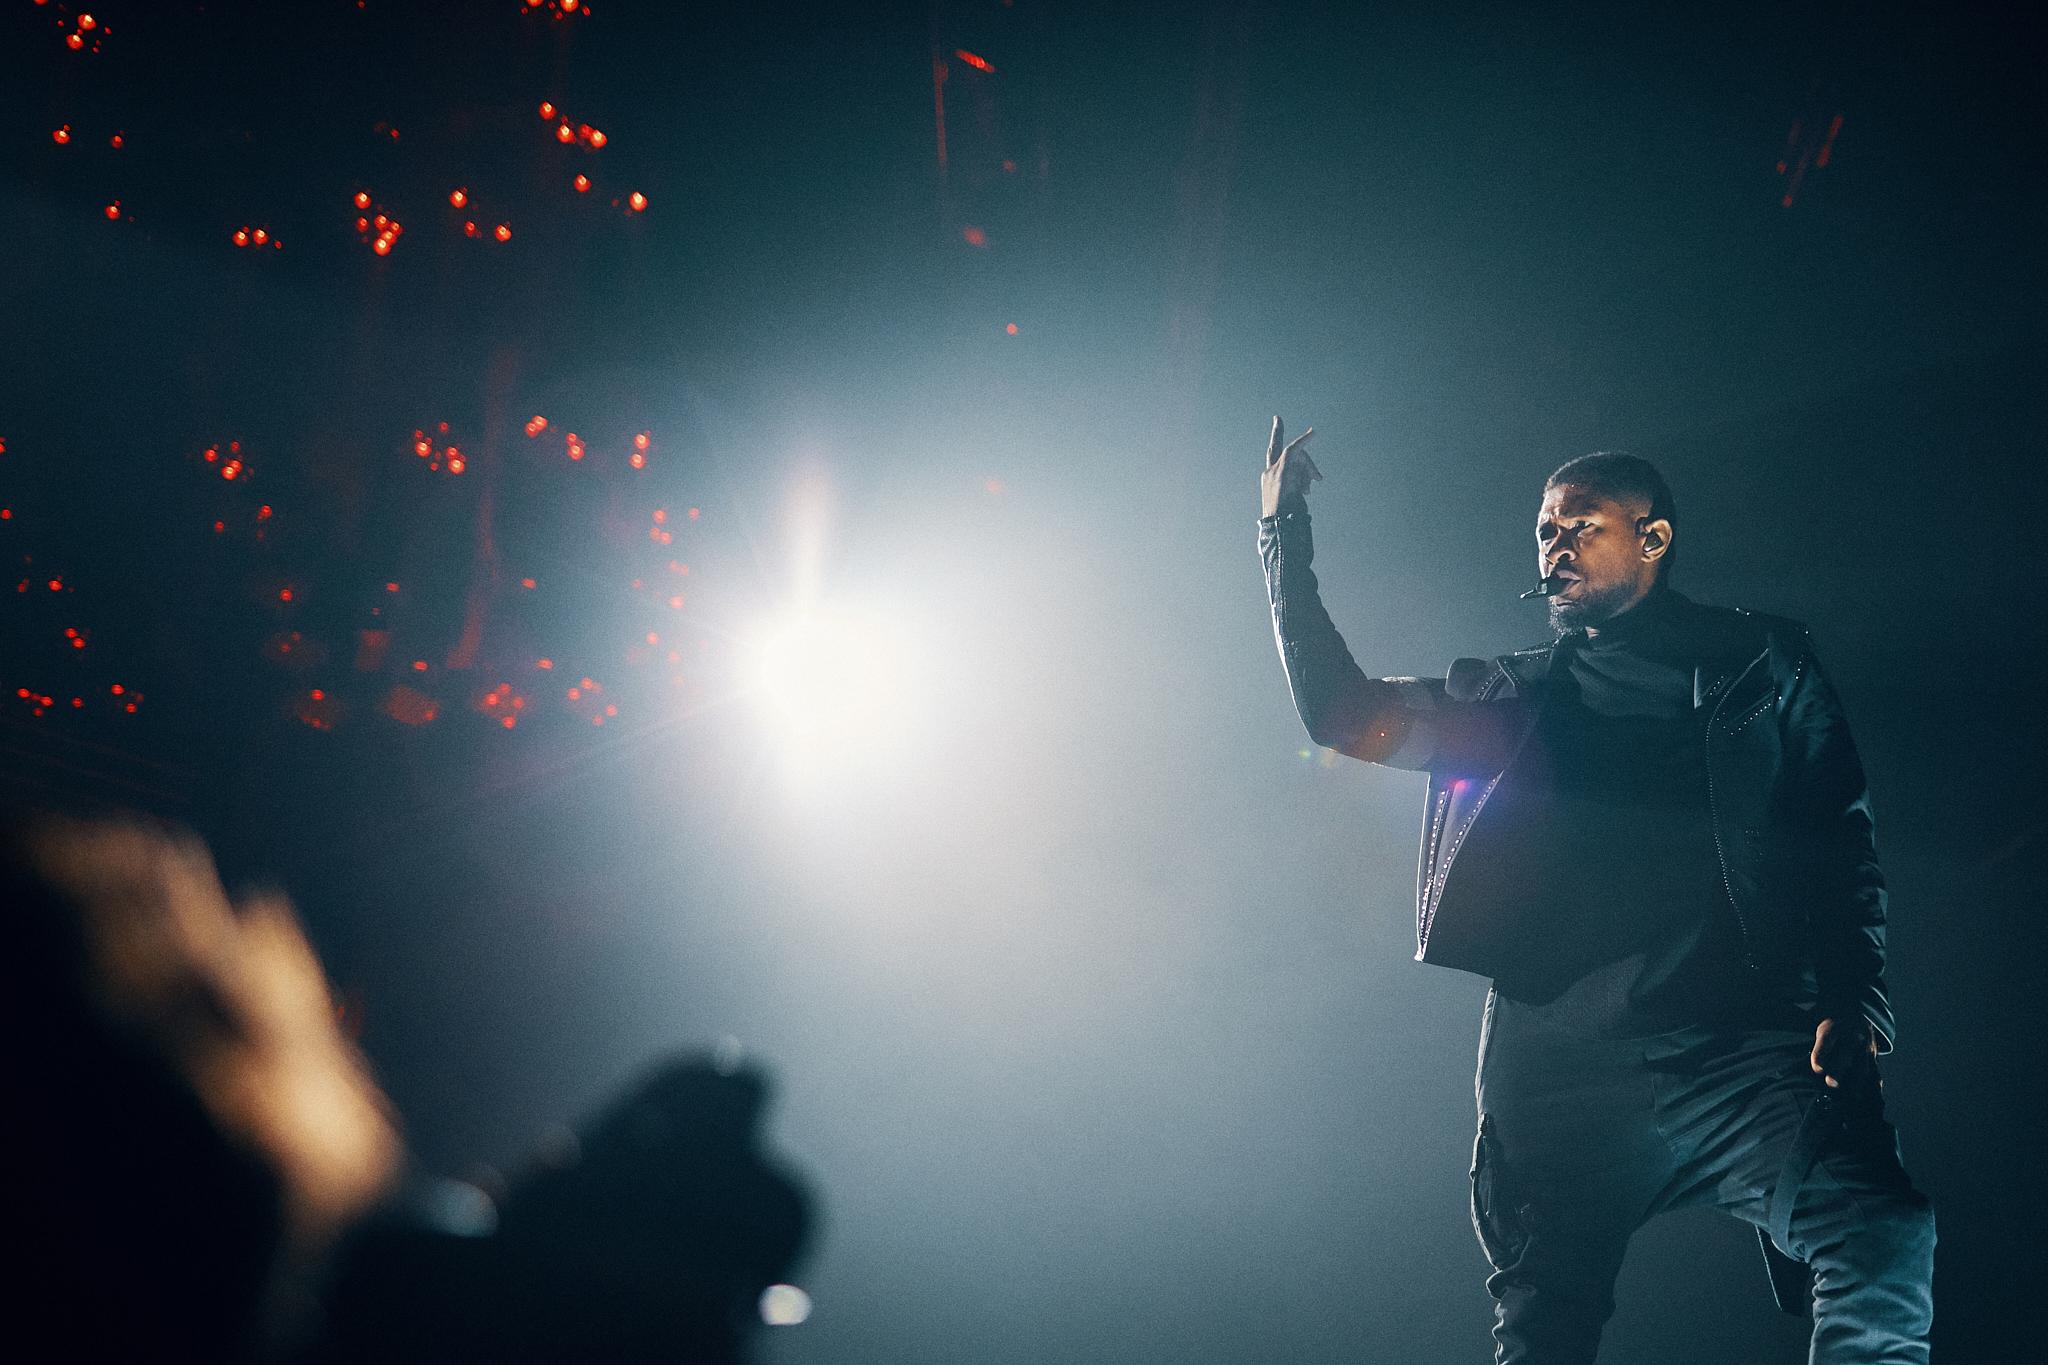 Usher_At_Xcel_Energy_Center_St_Paul_Minnesota_Twin_Cities_Music_Photographer_Joe_Lemke_057.JPG